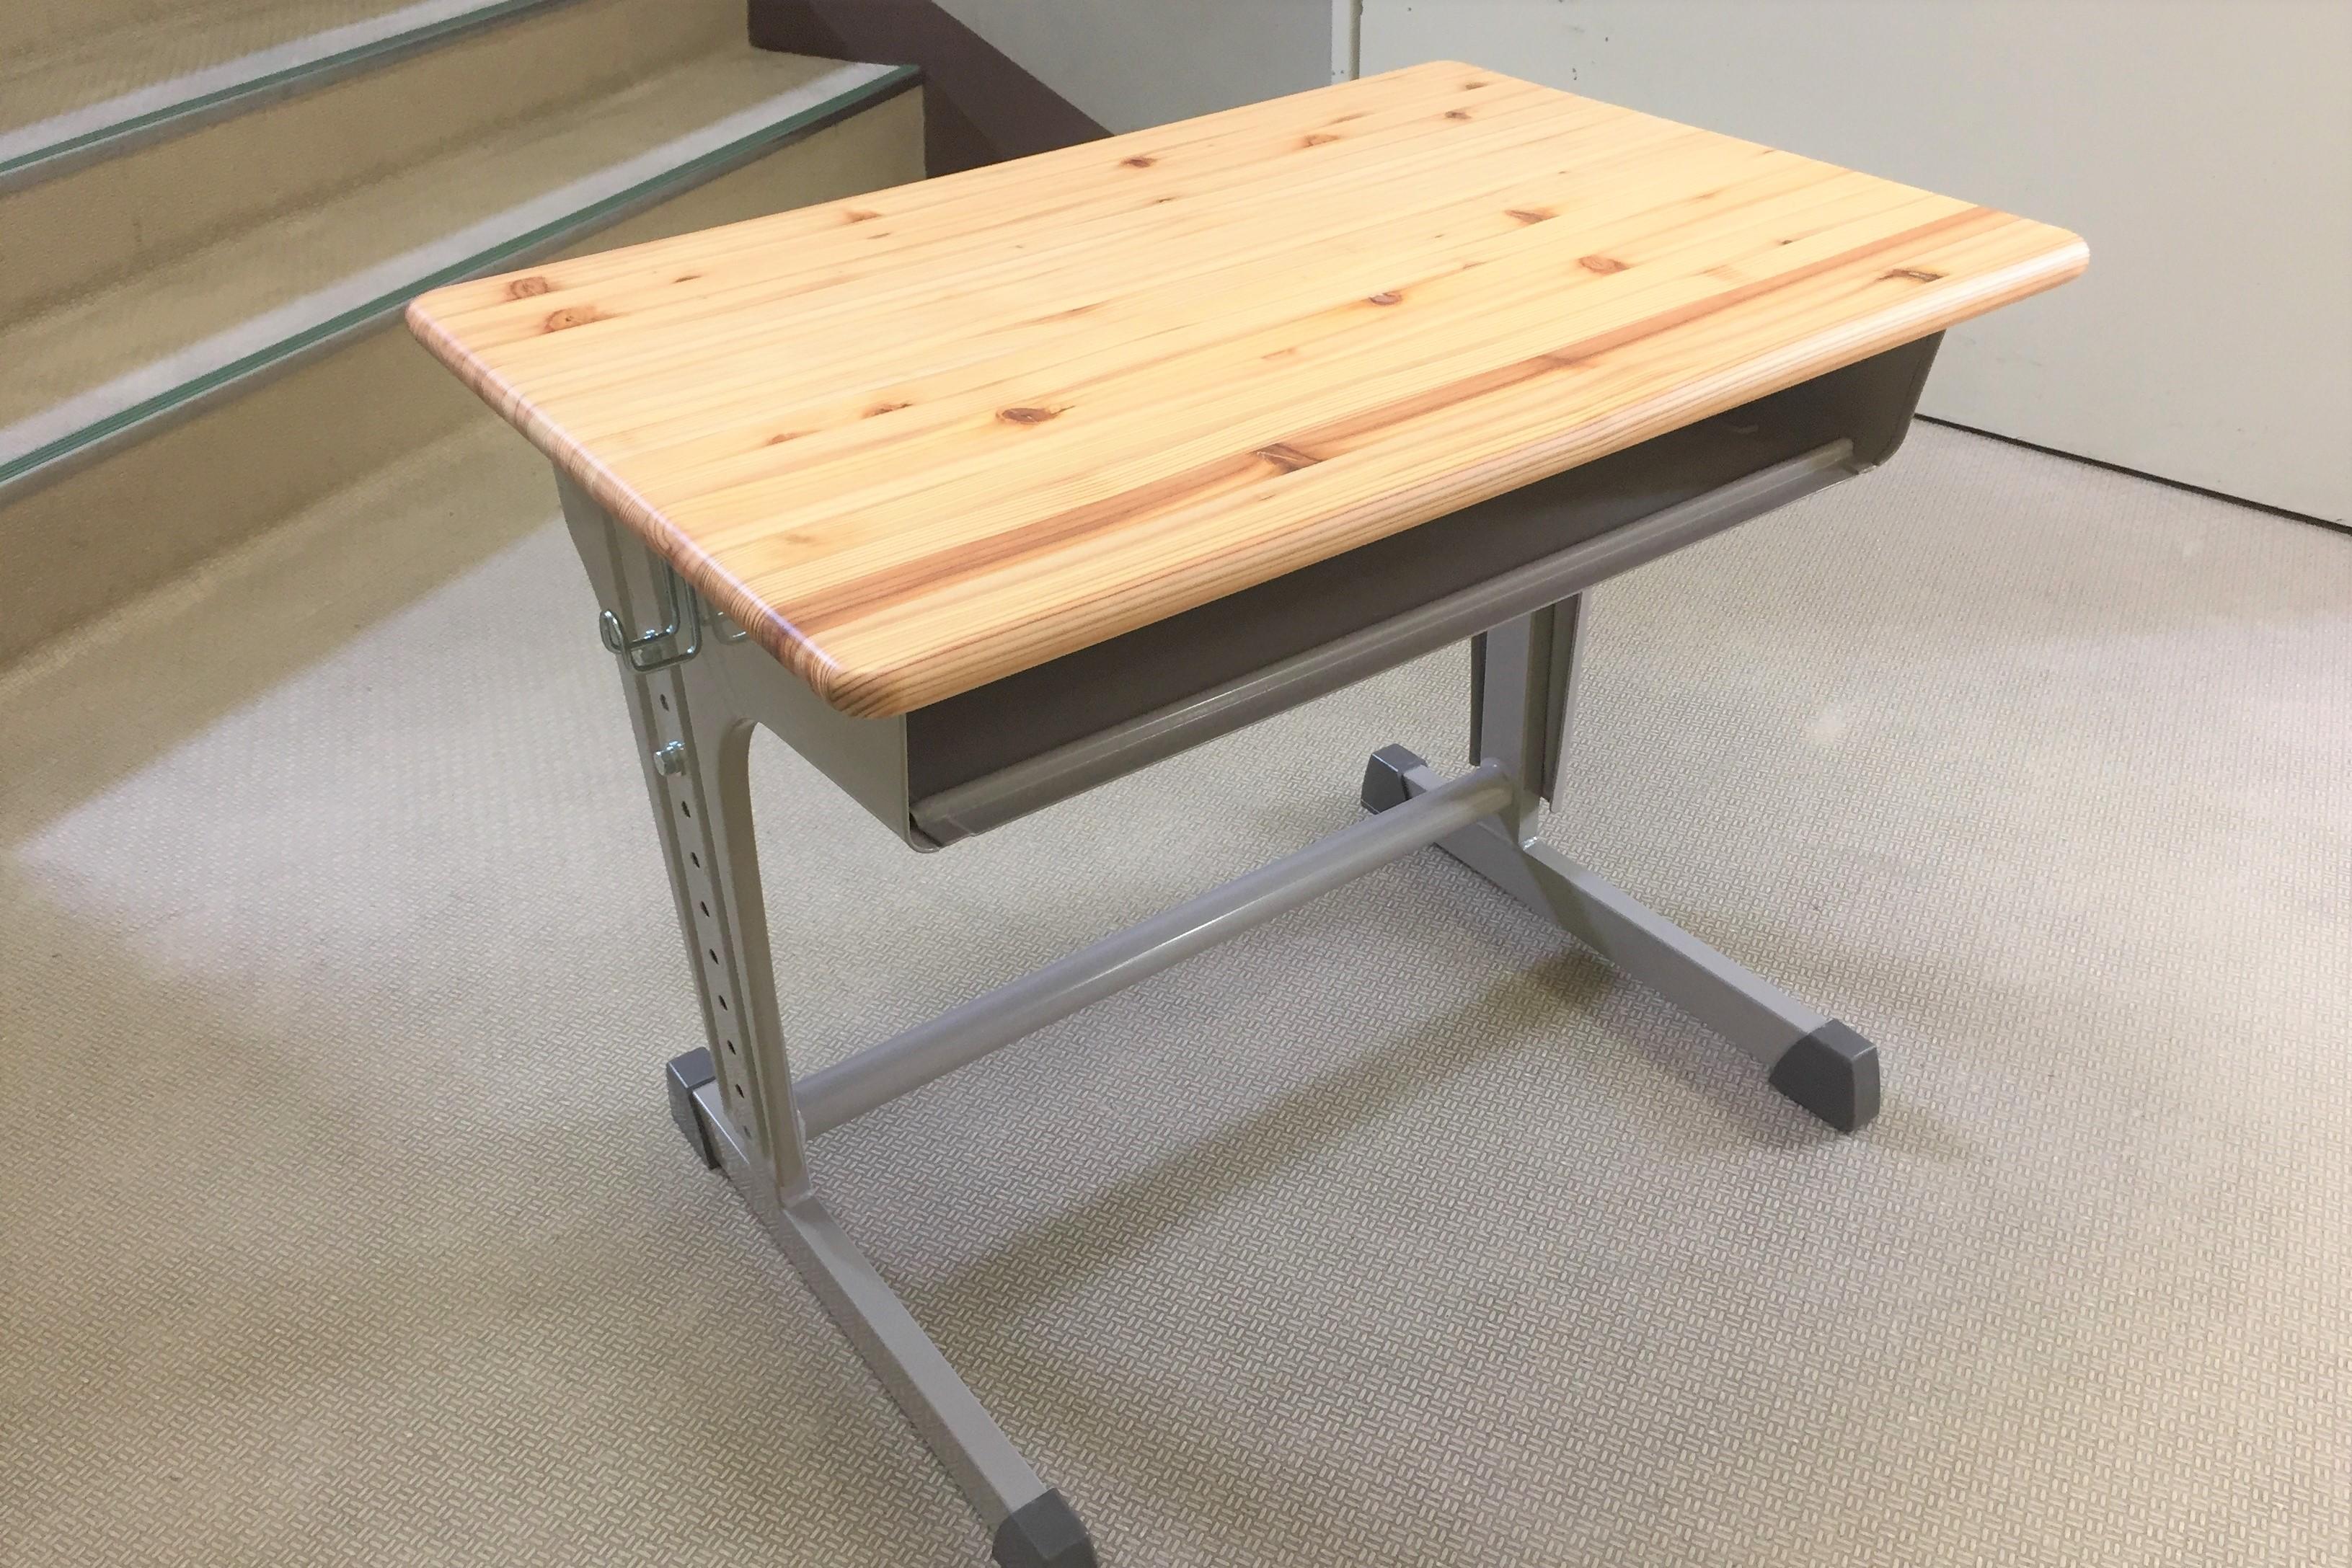 小学生用の学童机